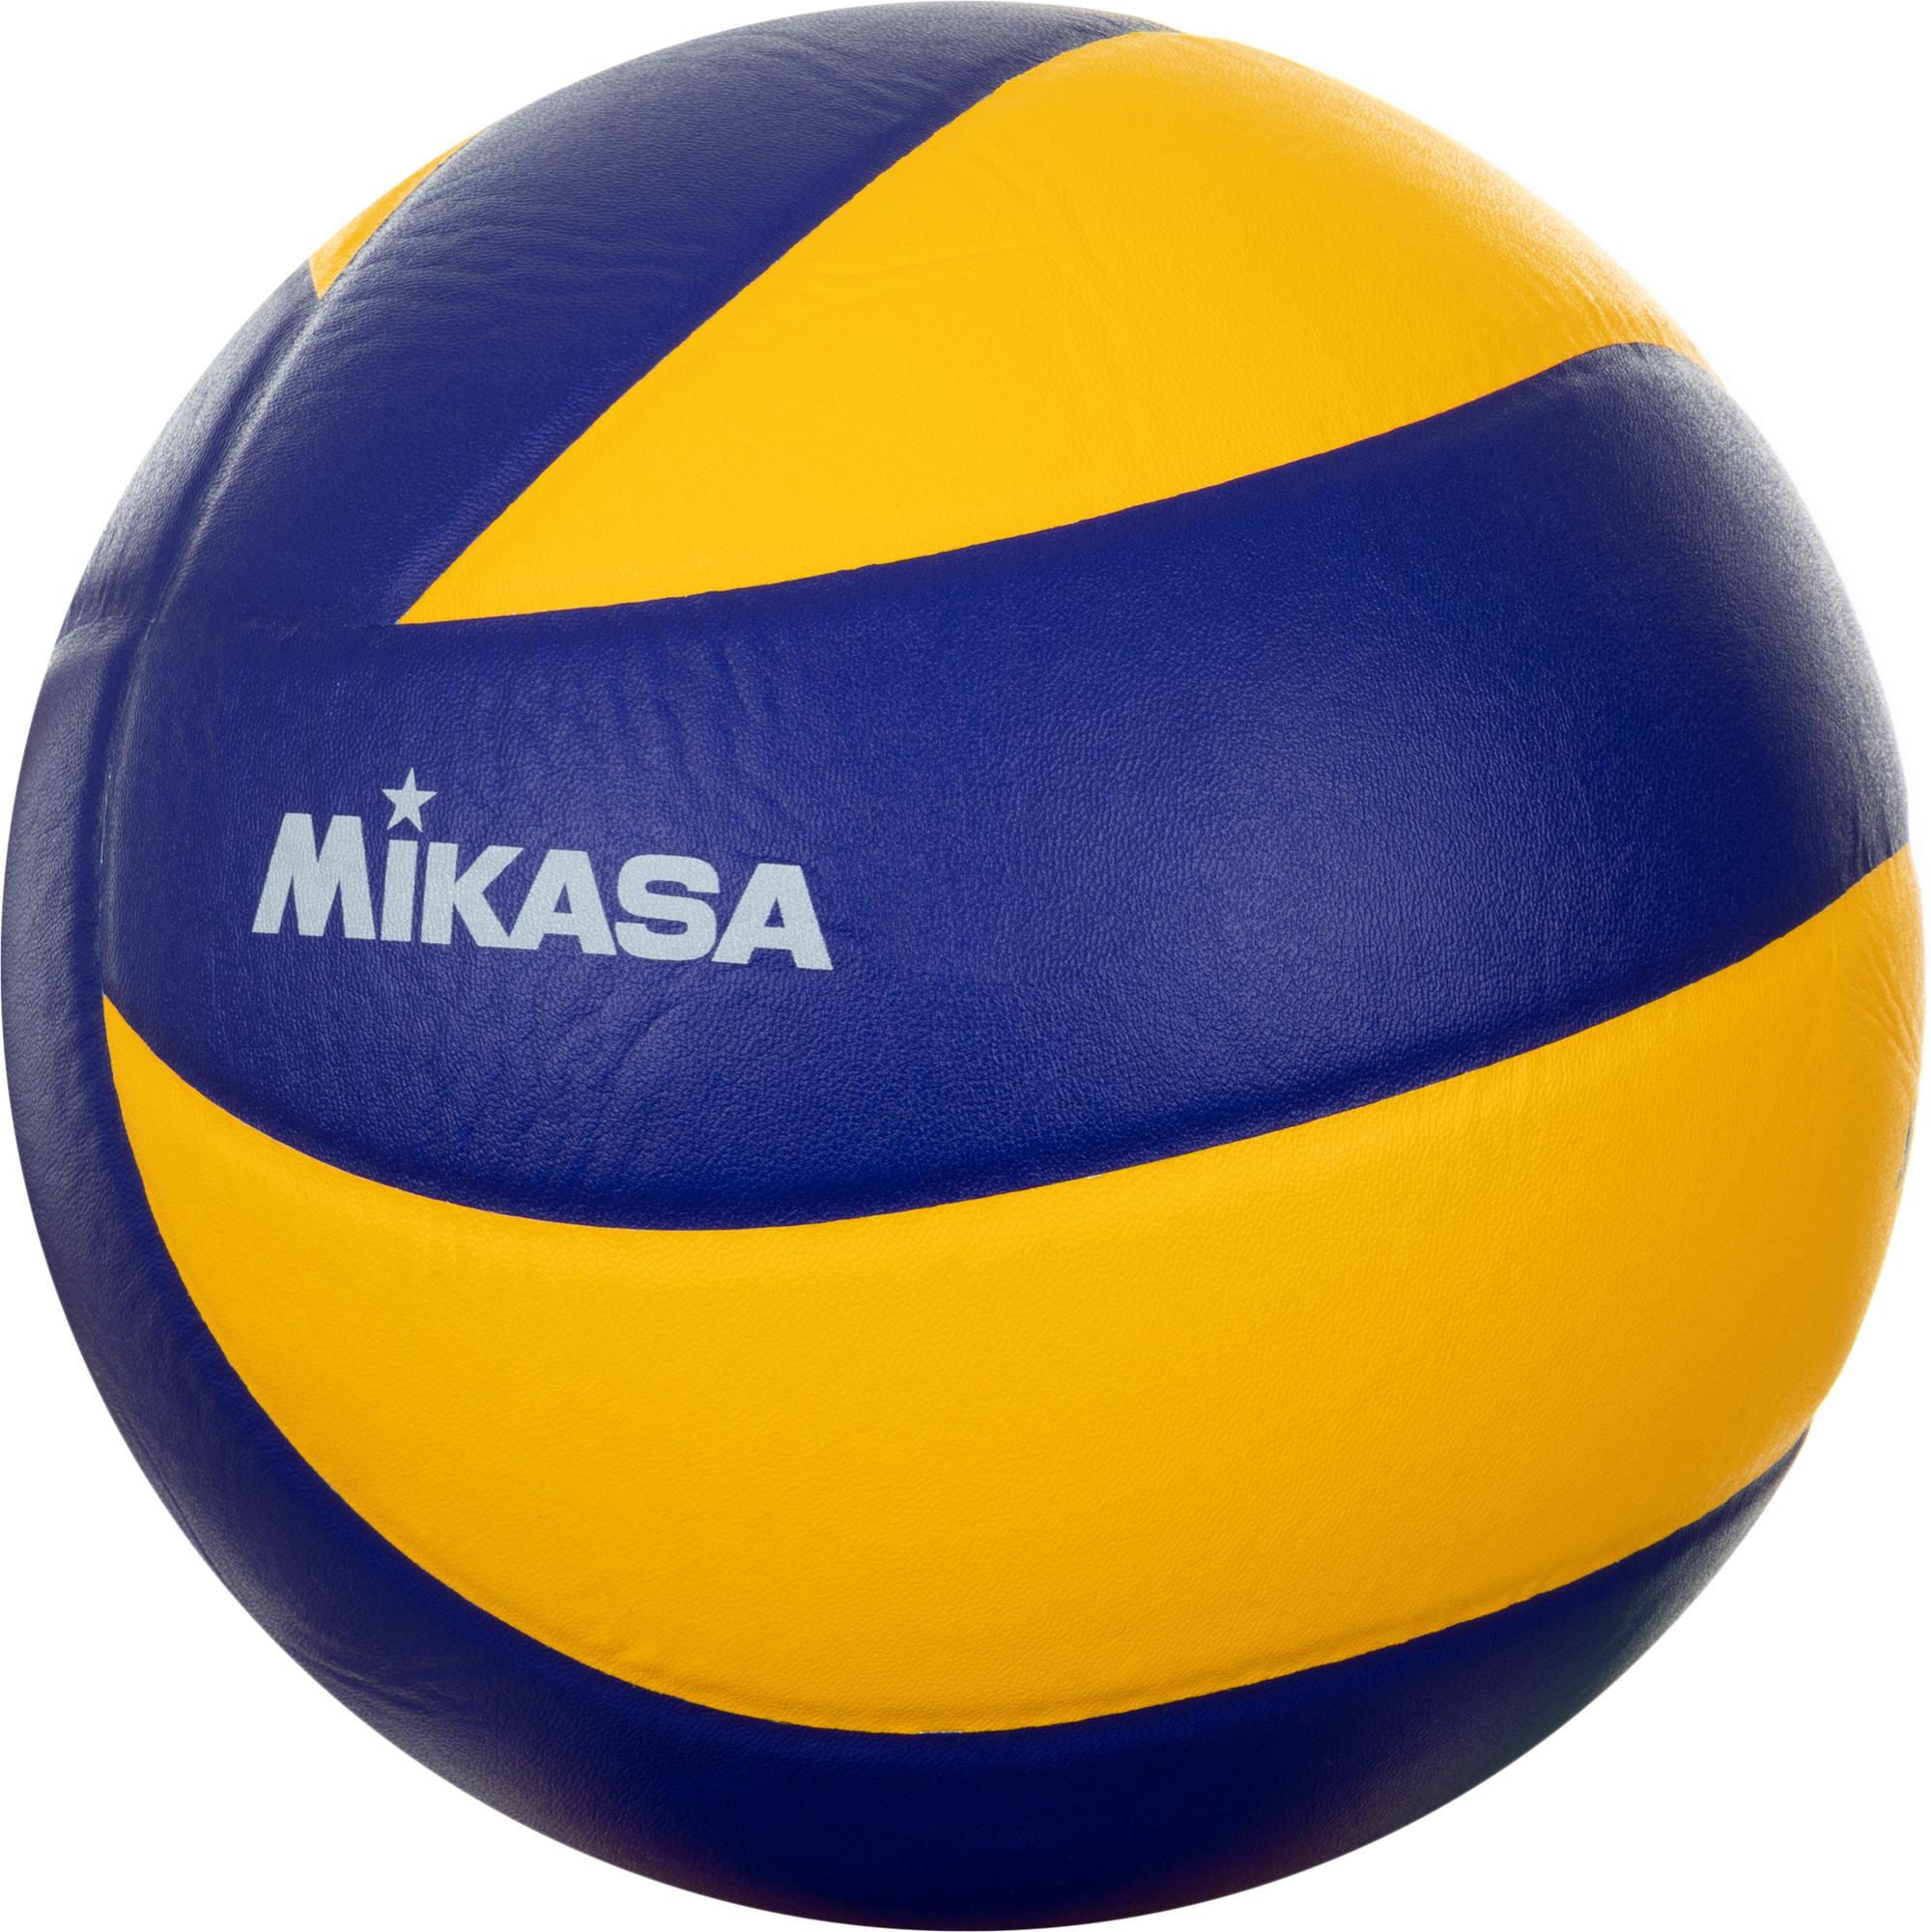 Mikasa Мяч волейбольный MIKASA MVA310 mikasa ag 500